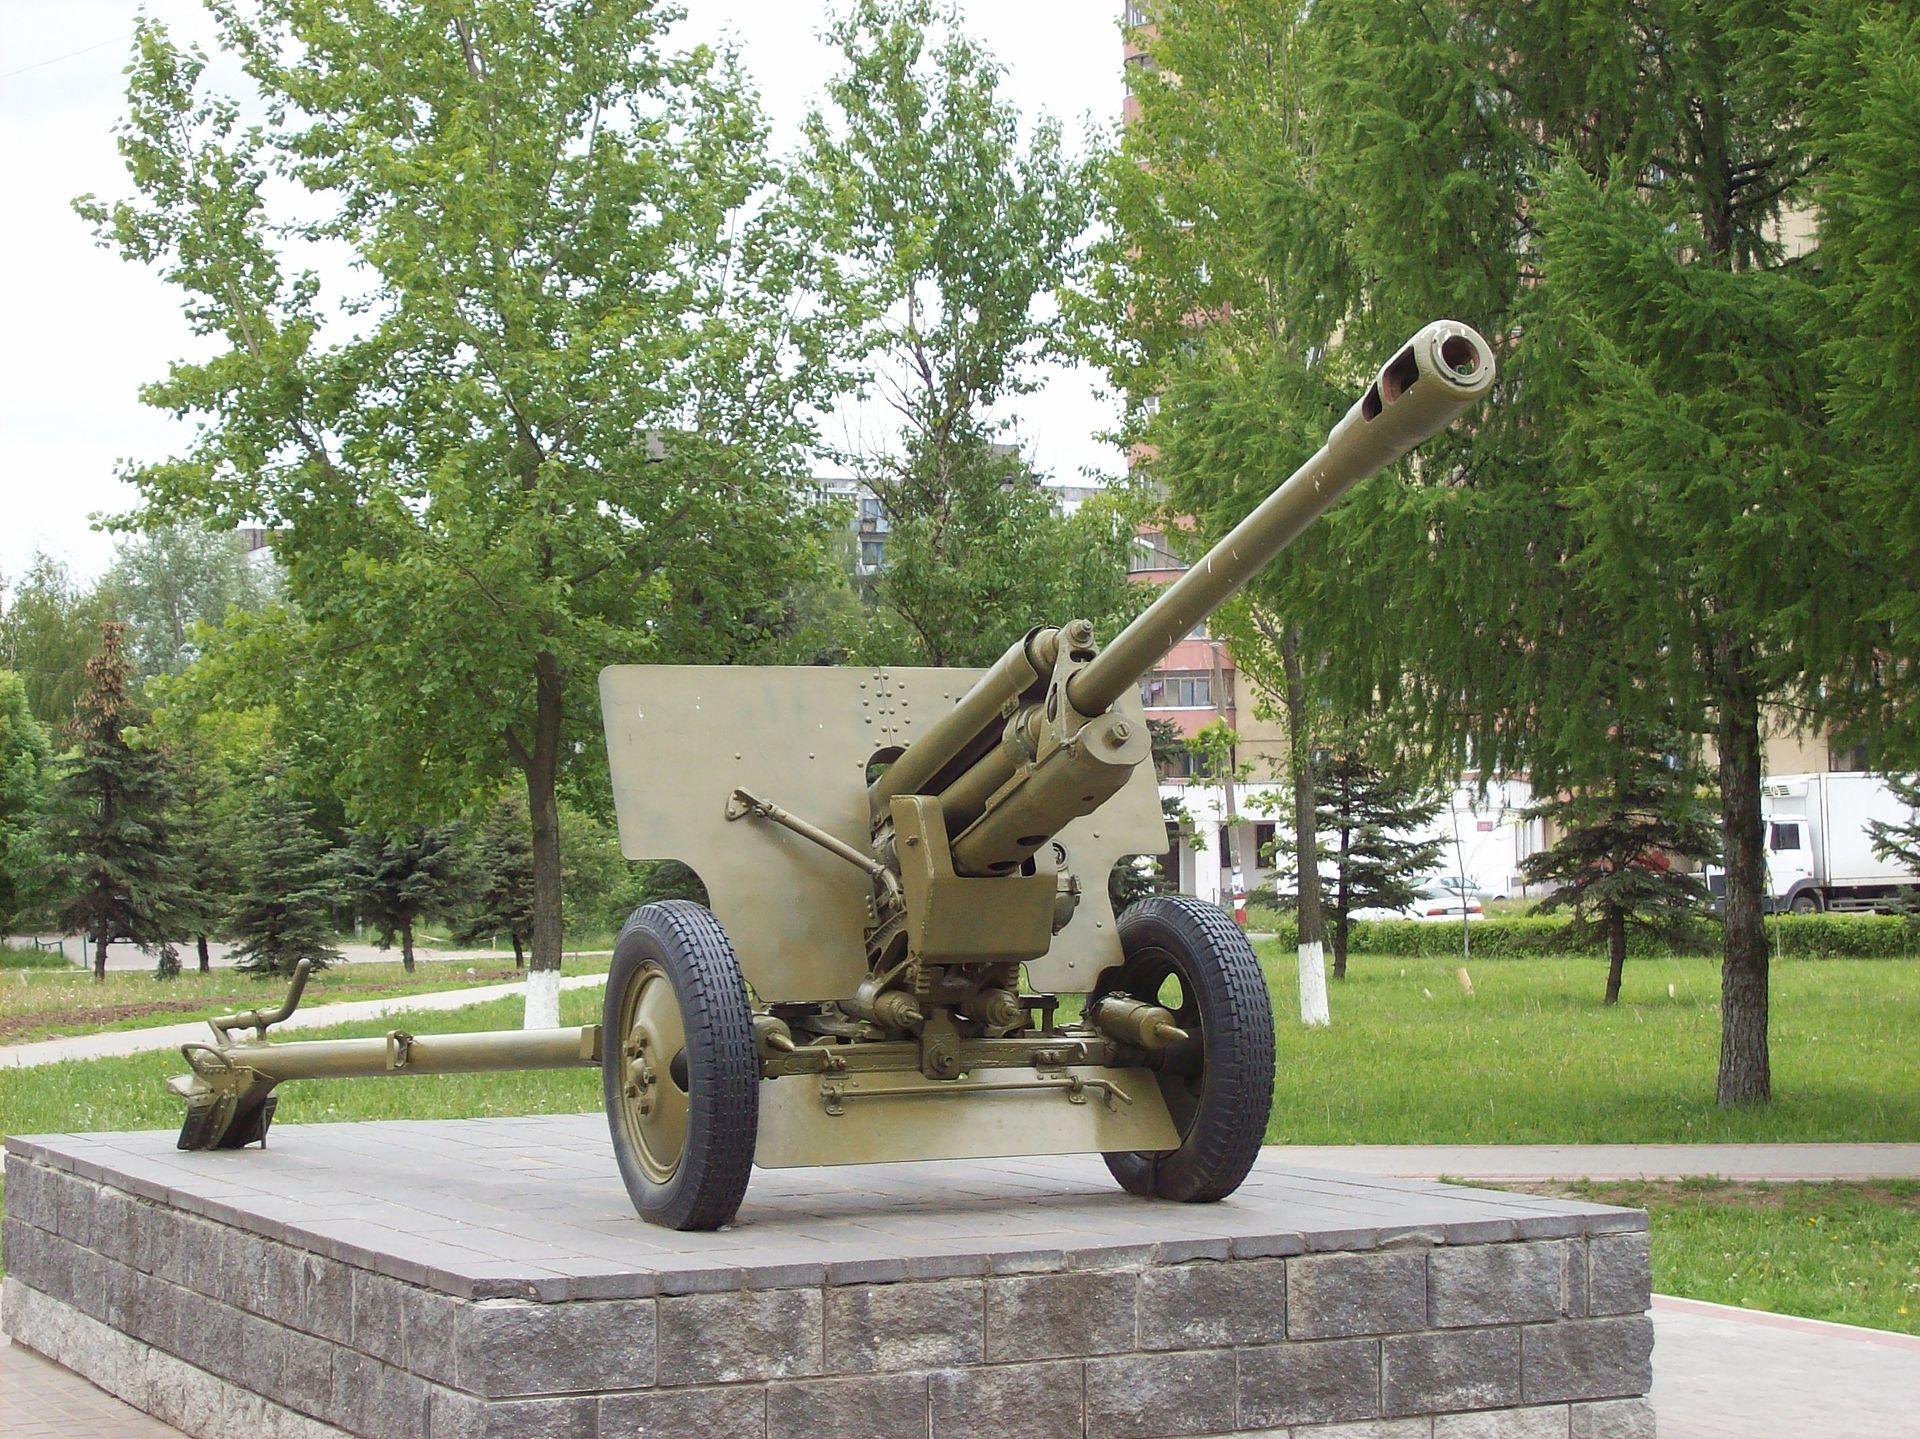 76 mm divisional gun m1942 zis 3 wikipedia. Black Bedroom Furniture Sets. Home Design Ideas